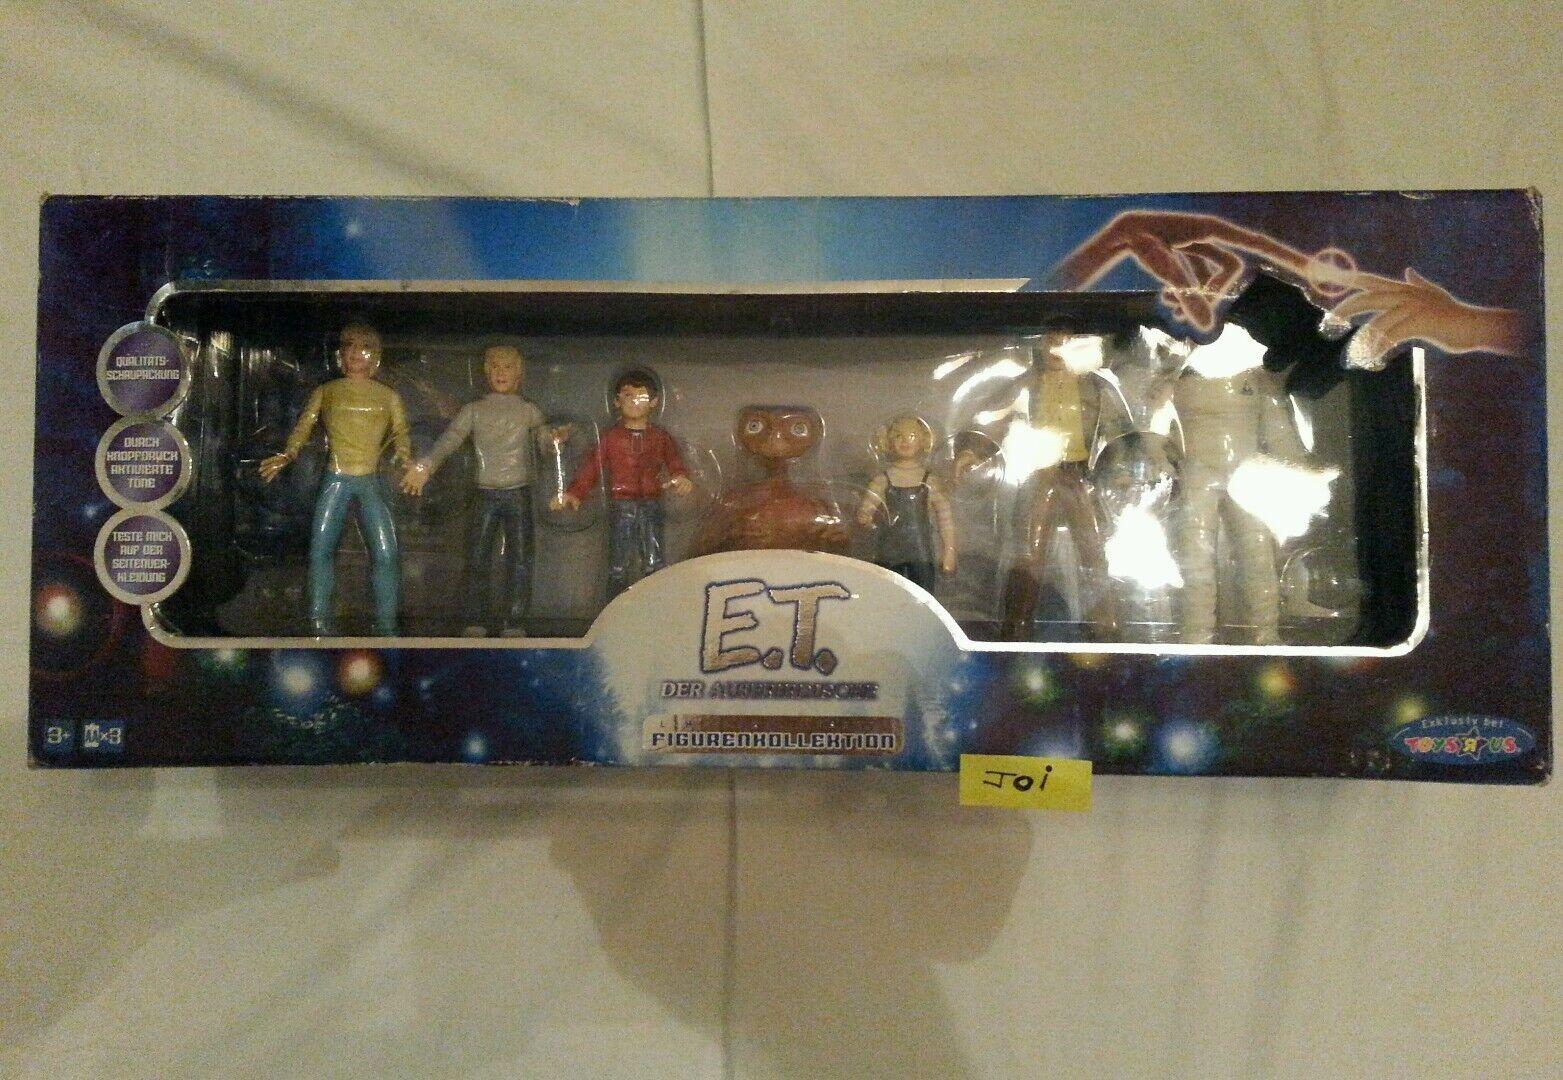 E.T Extraterrestre action figure completo 2001 nuovo